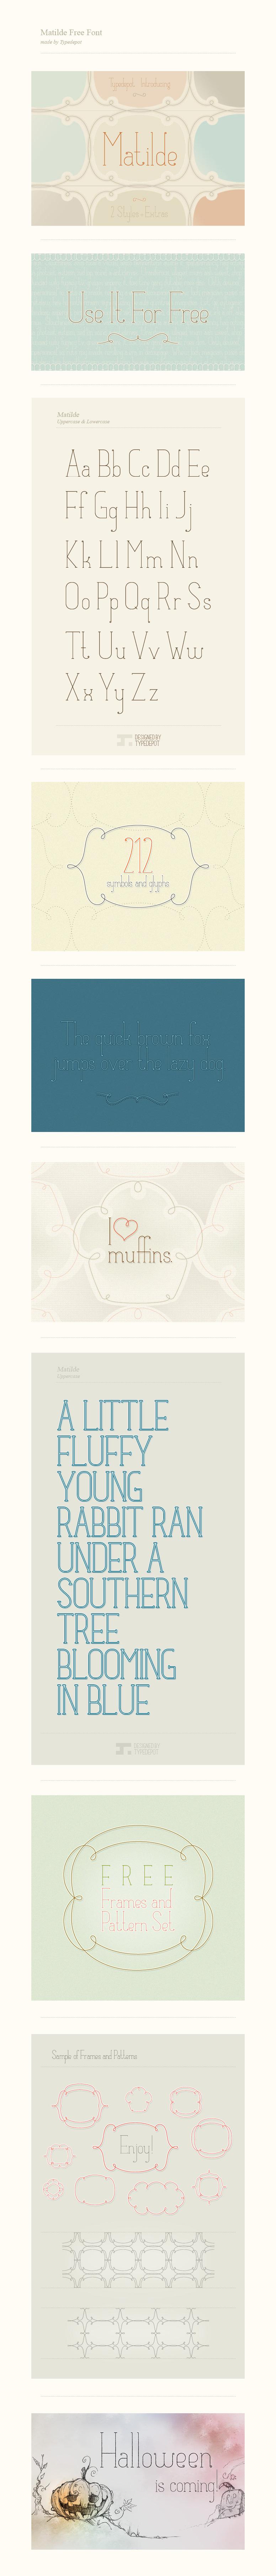 Matilde – Free Ultra-Thin Font Poster A